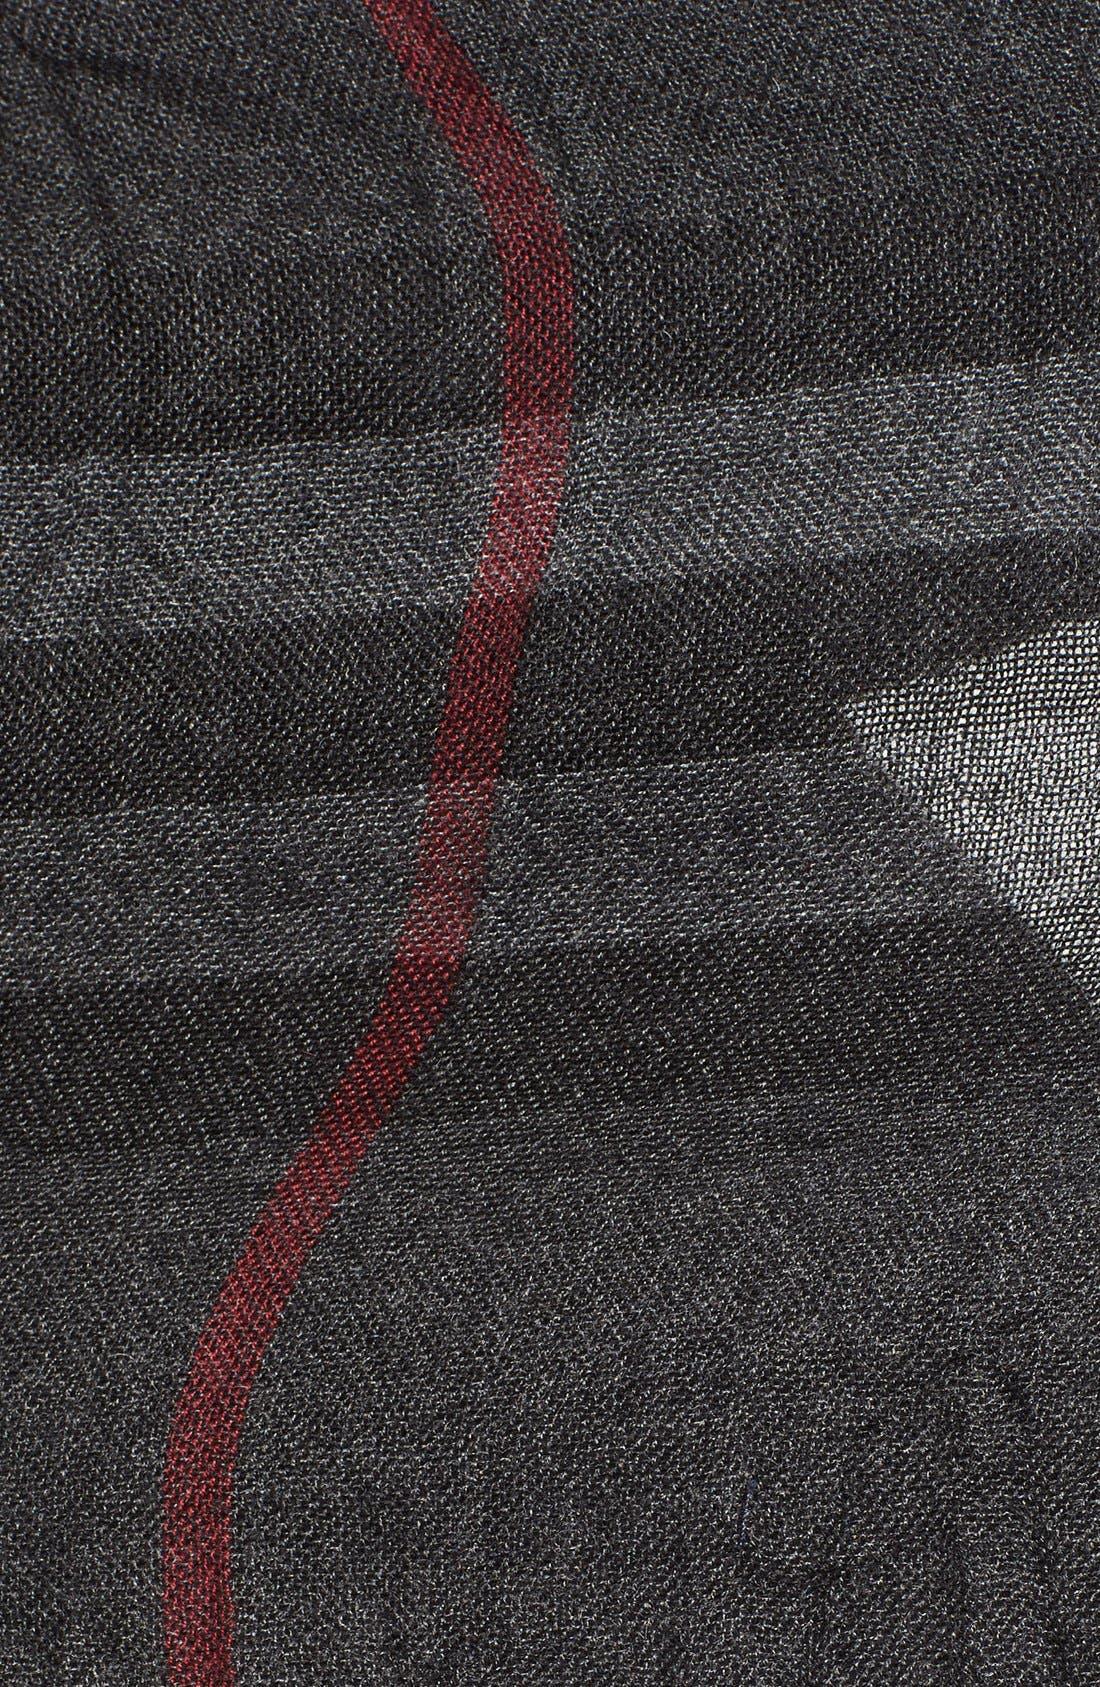 Alternate Image 2  - Burberry Crinkled Merino Wool & Cashmere Scarf